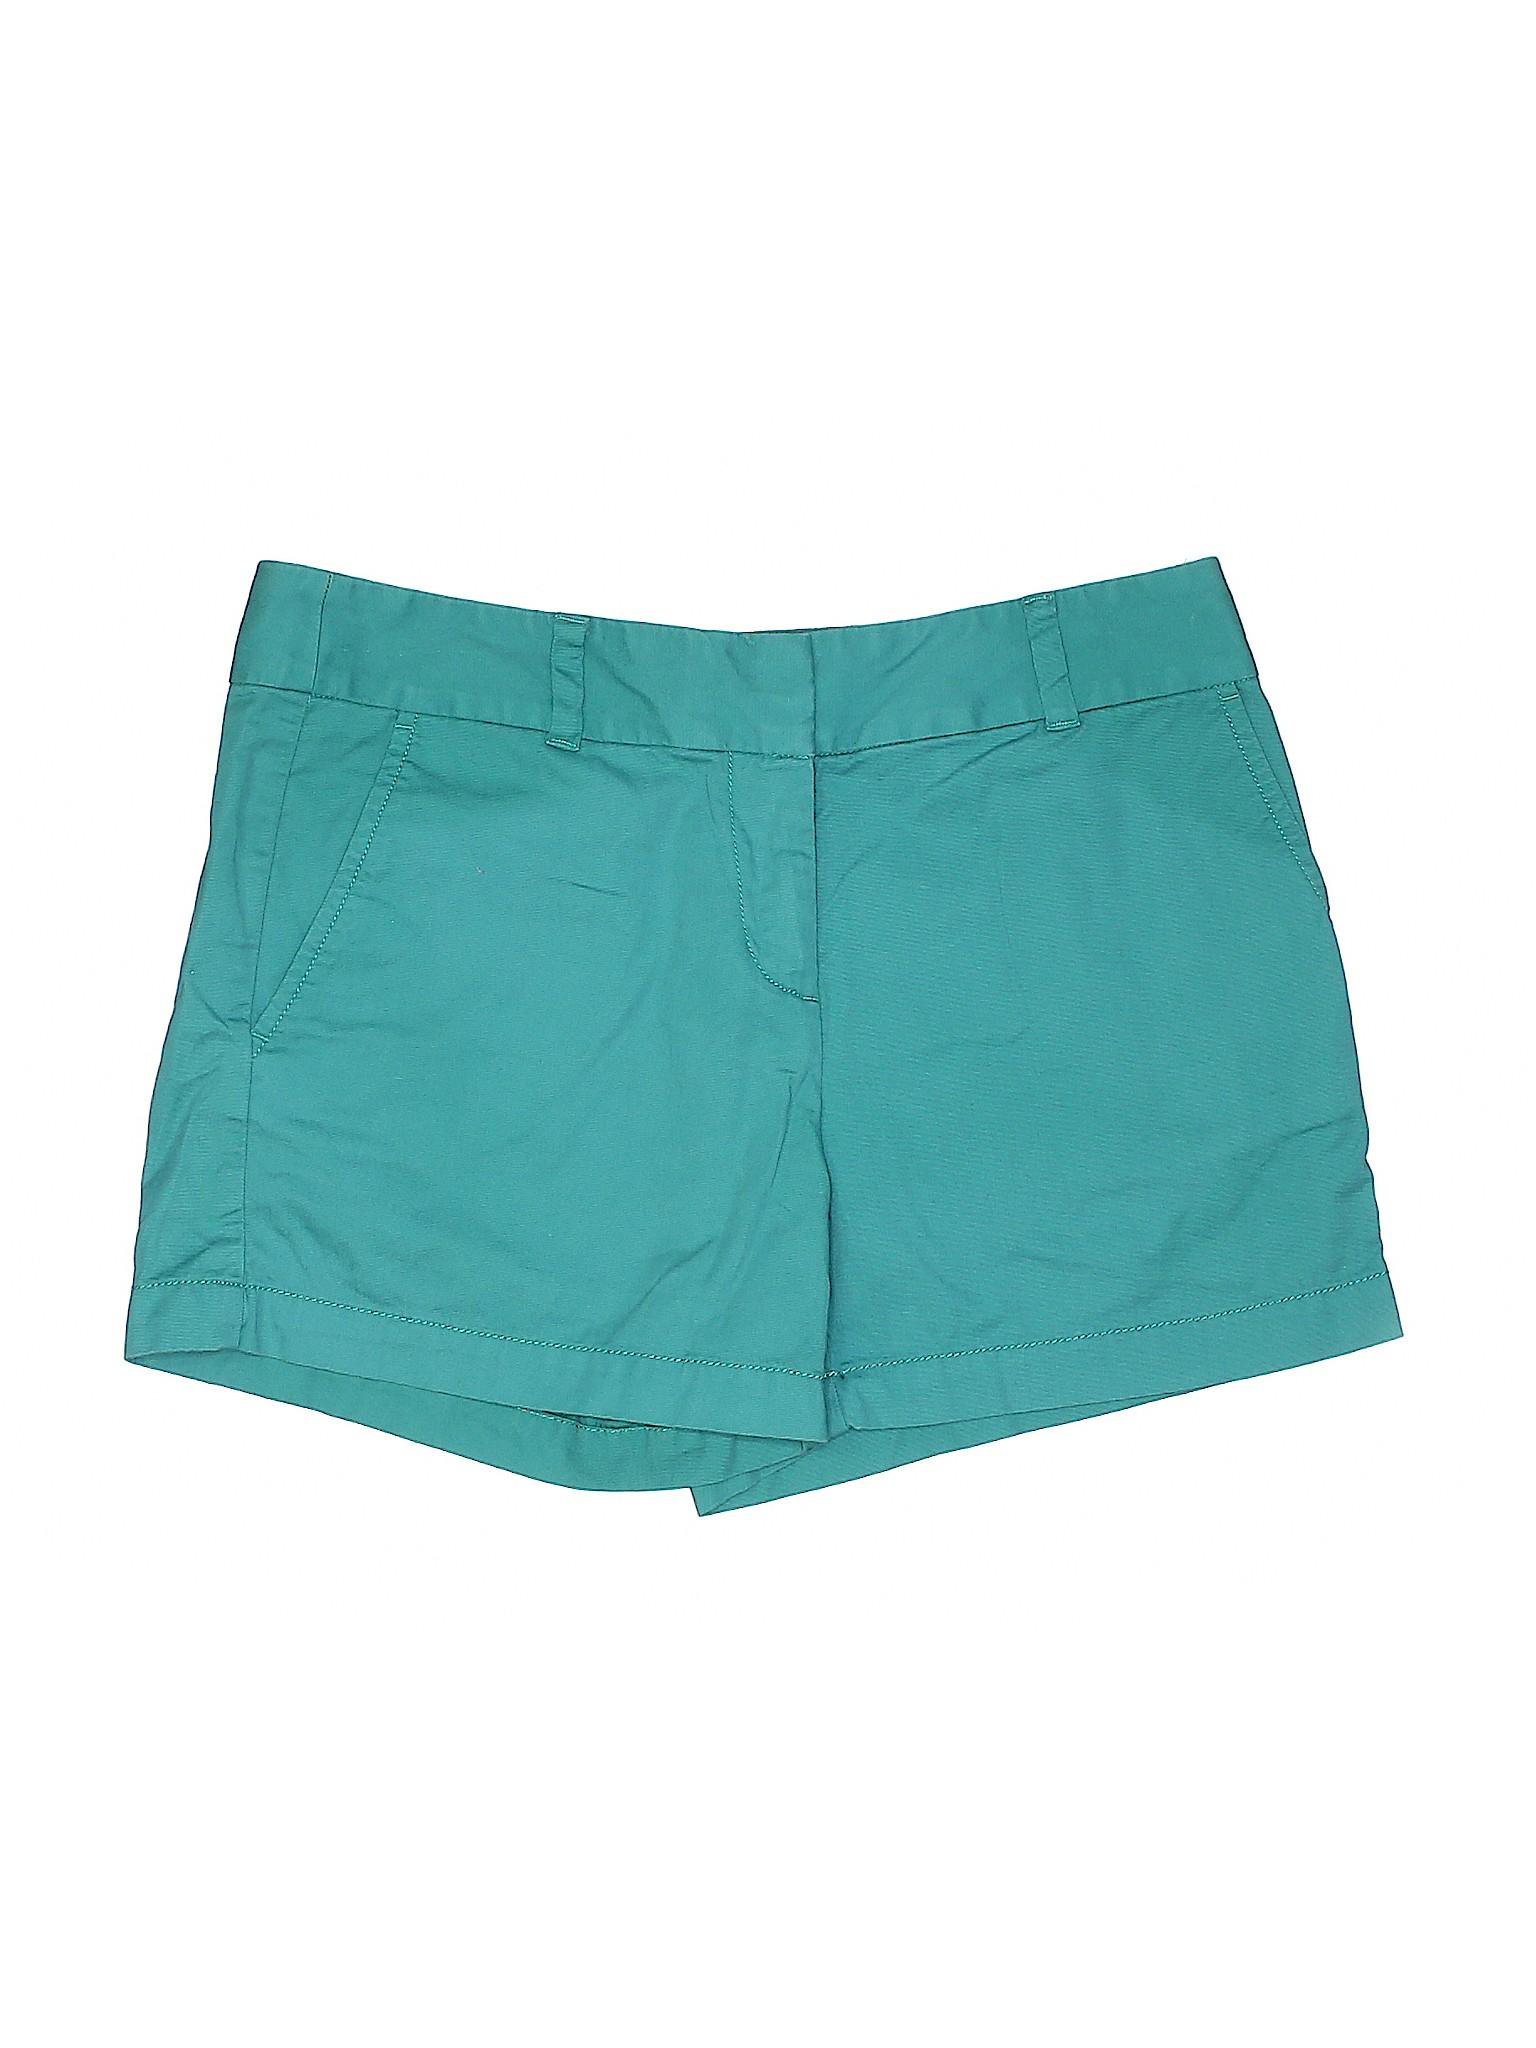 Khaki Ann Taylor Outlet Shorts Boutique LOFT I4awg